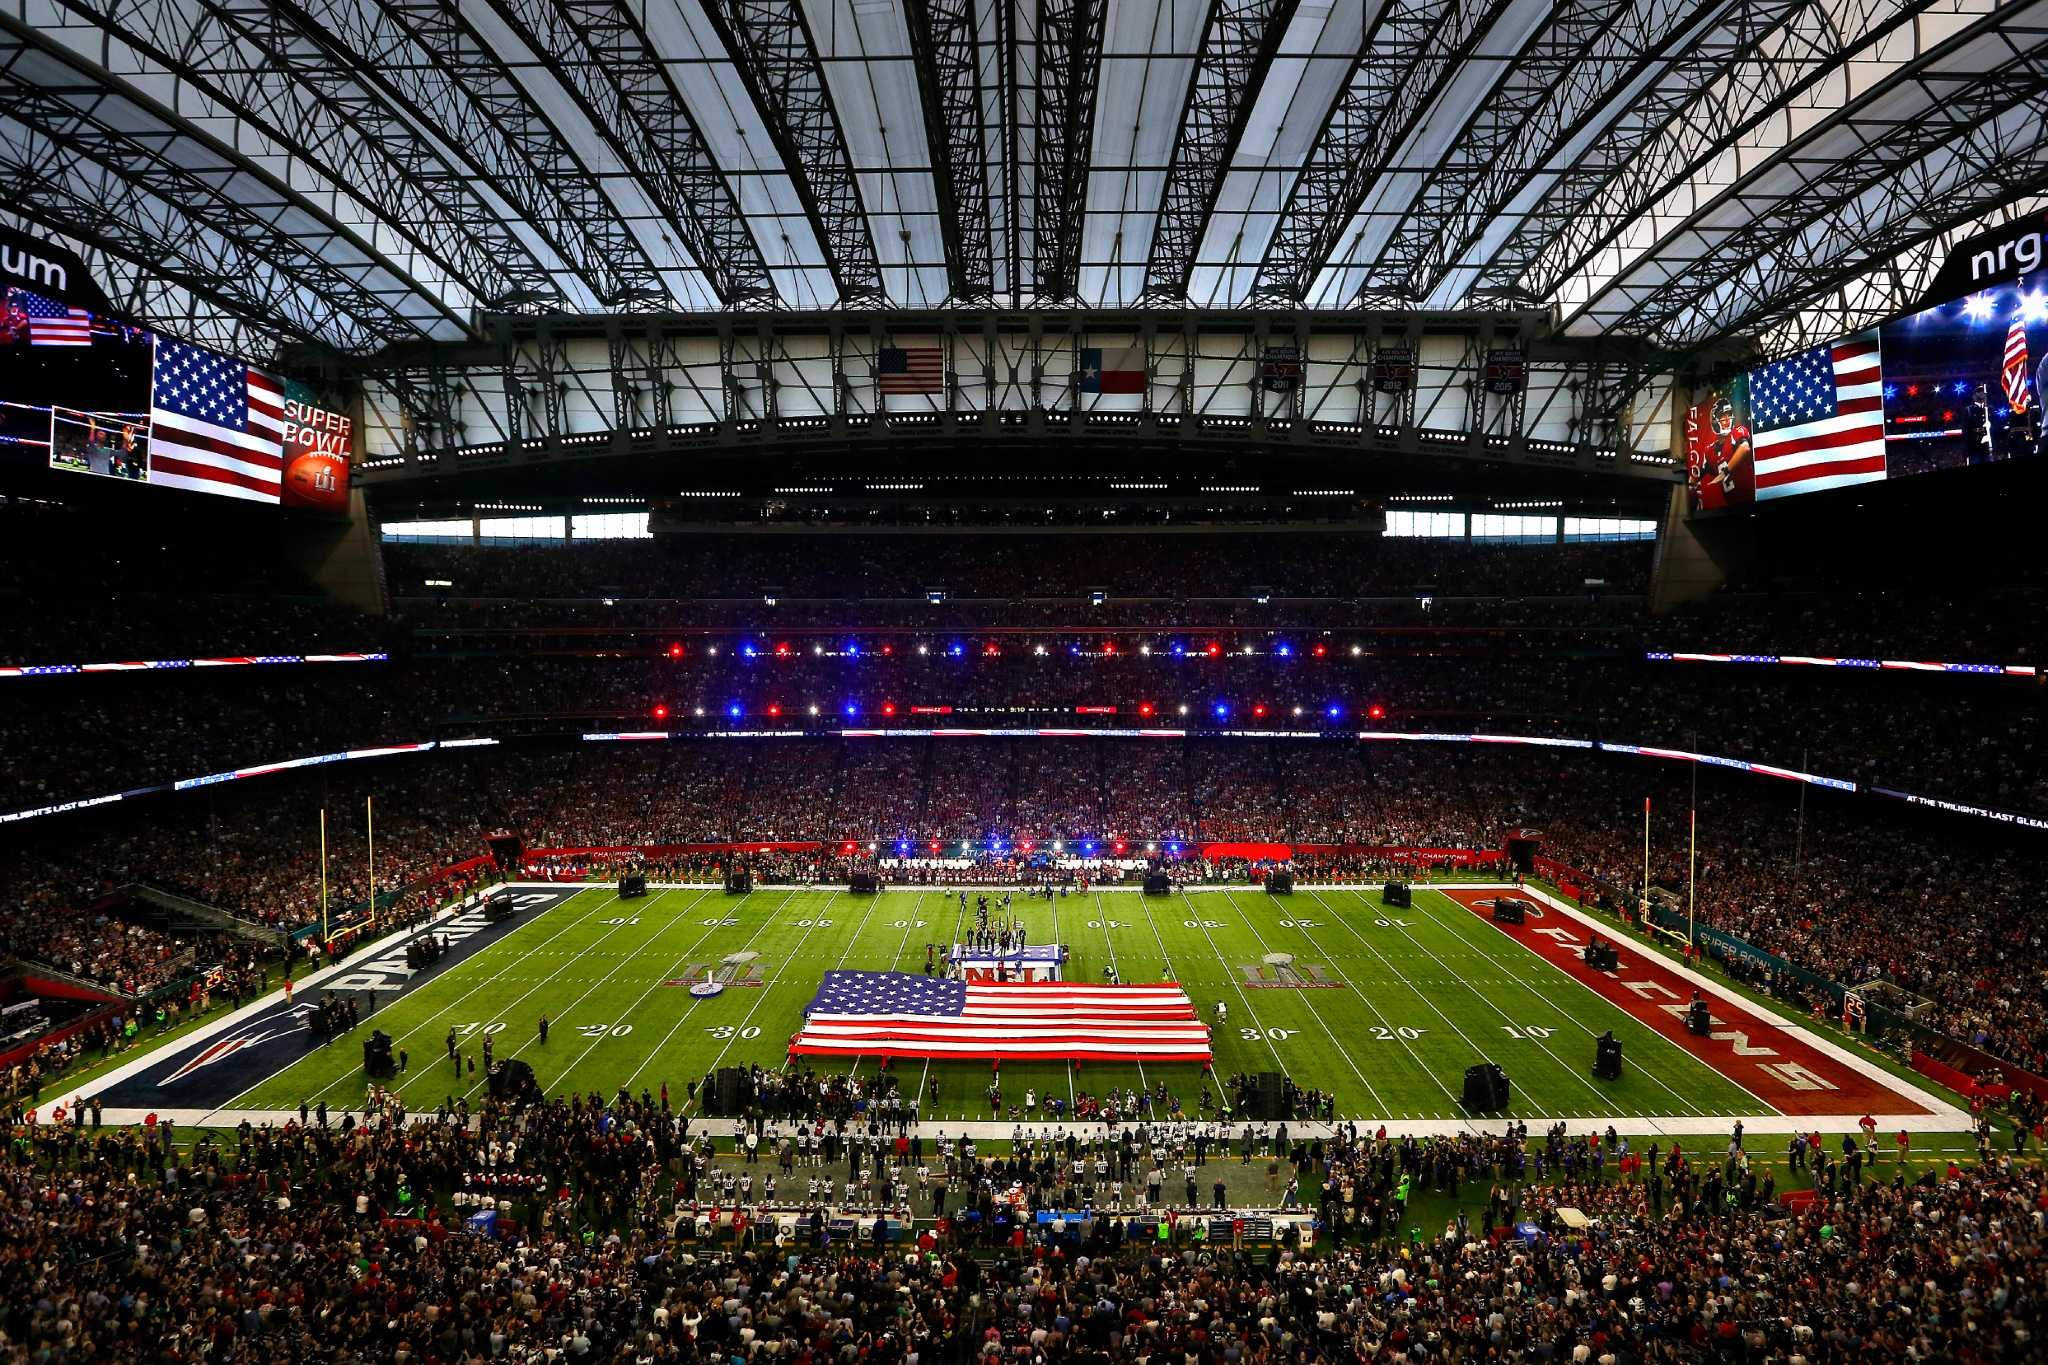 Photos: Super Bowl 51 hits Houston's NRG Stadium - Houston ...